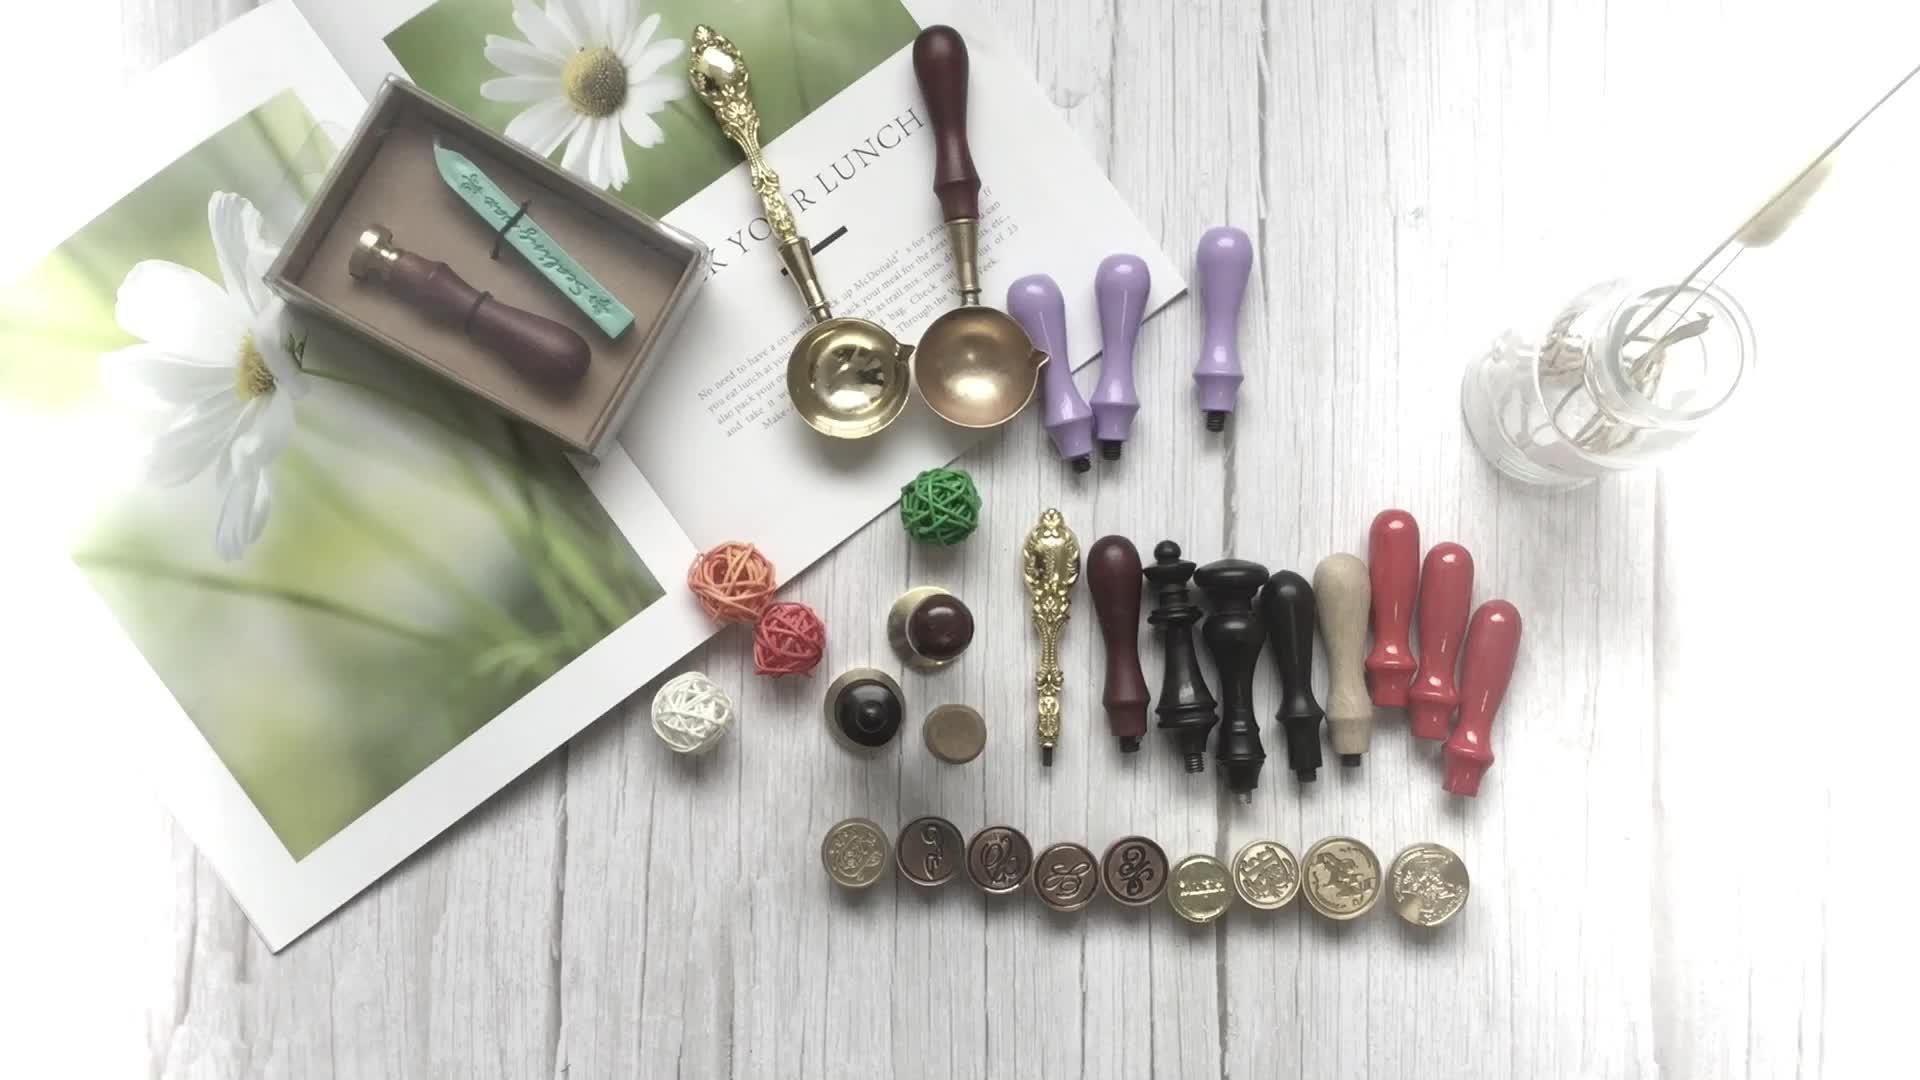 JinYuan Antique Alphabet Wax Seal sealing Stamp Sticks Melting Spoon Candles Set with Gift Box (N )